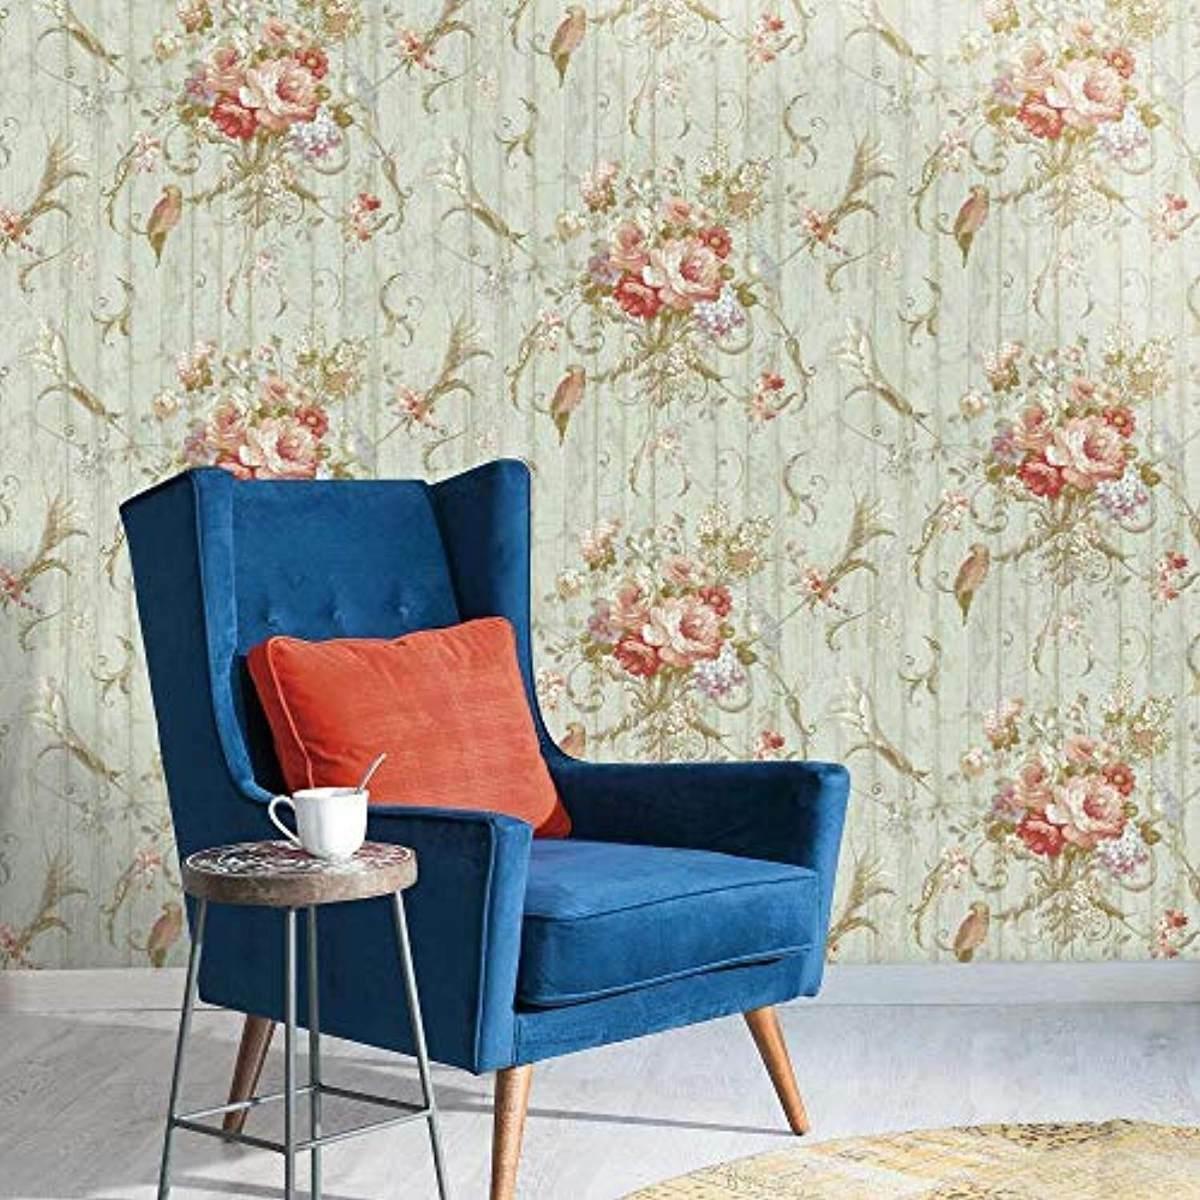 York Ha1326 Vintage Victorian Floral Bouquets Bird Rose Blue